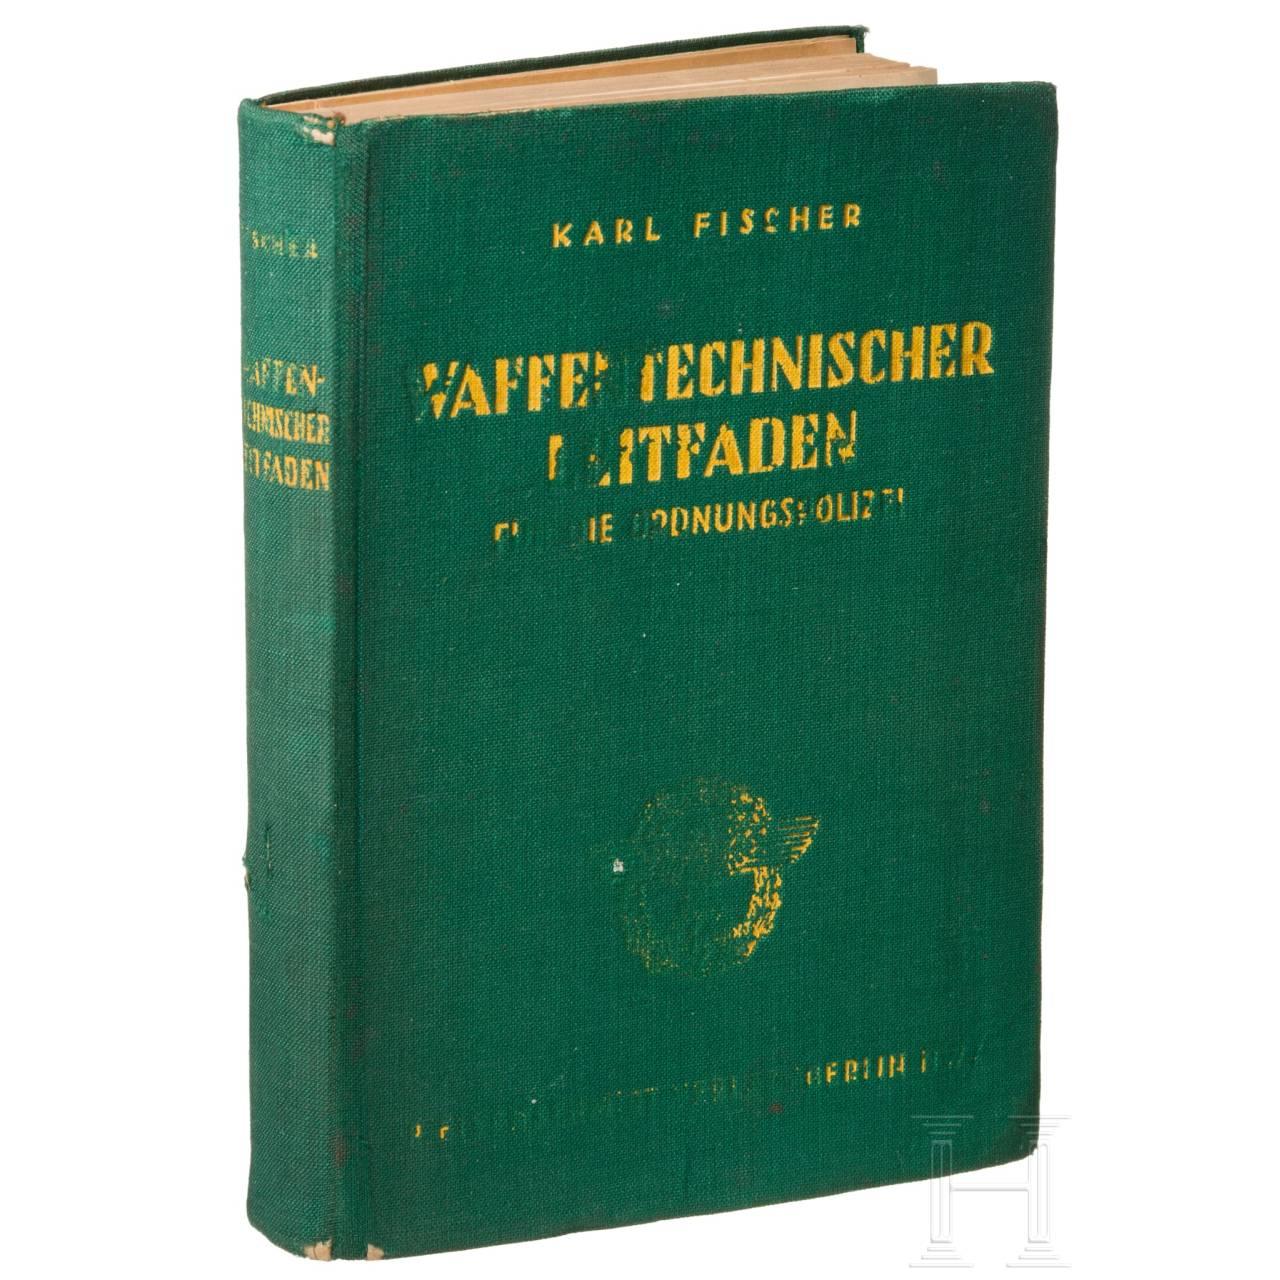 Original handbook on police equipment, 1941 (in German)